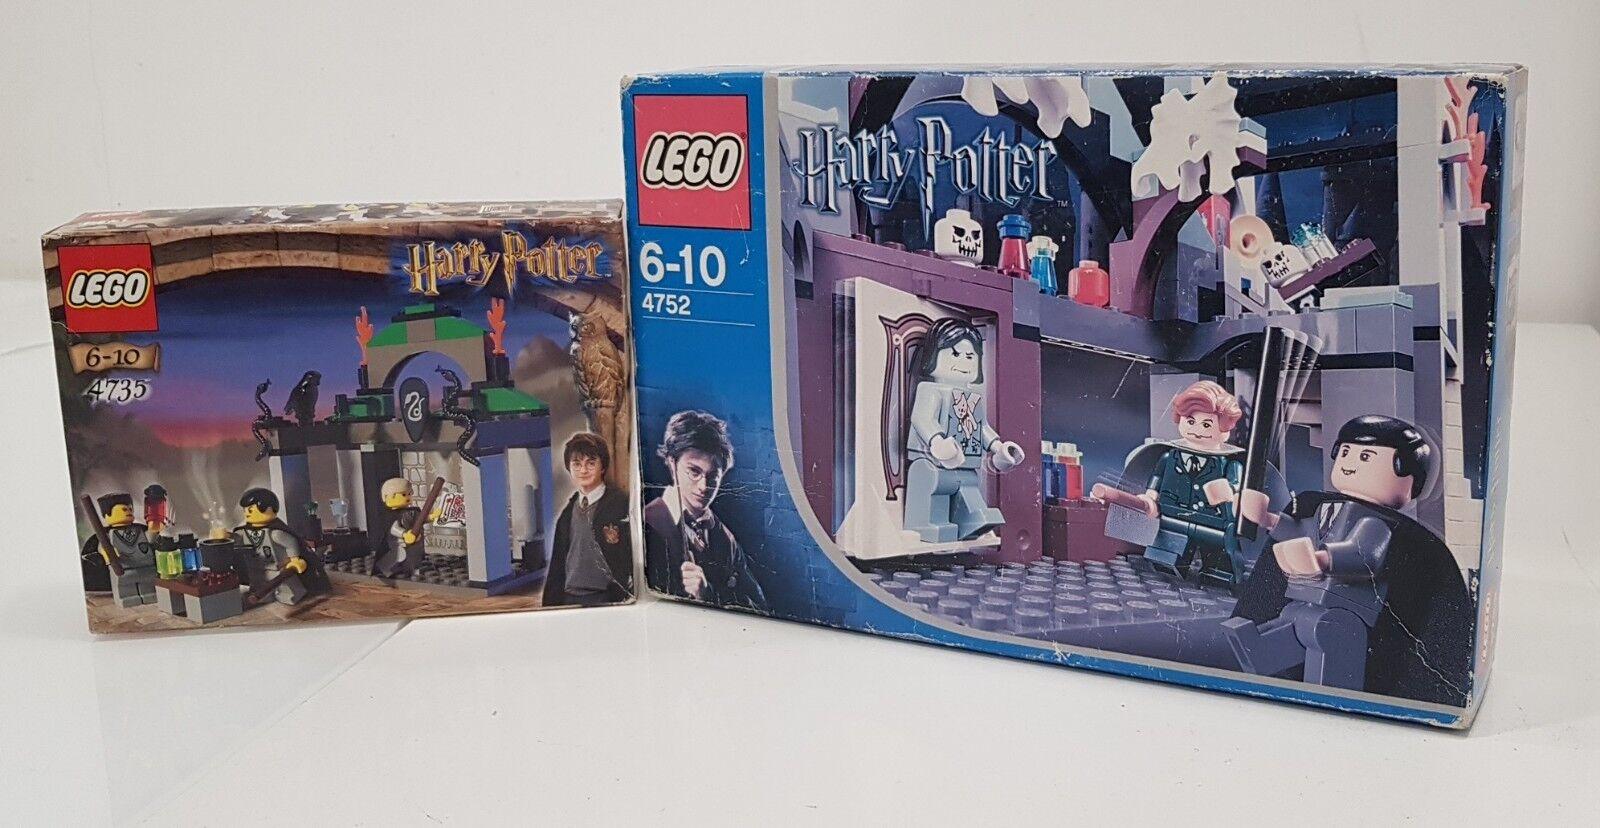 LEGO HARRY POTTER 4735 4752